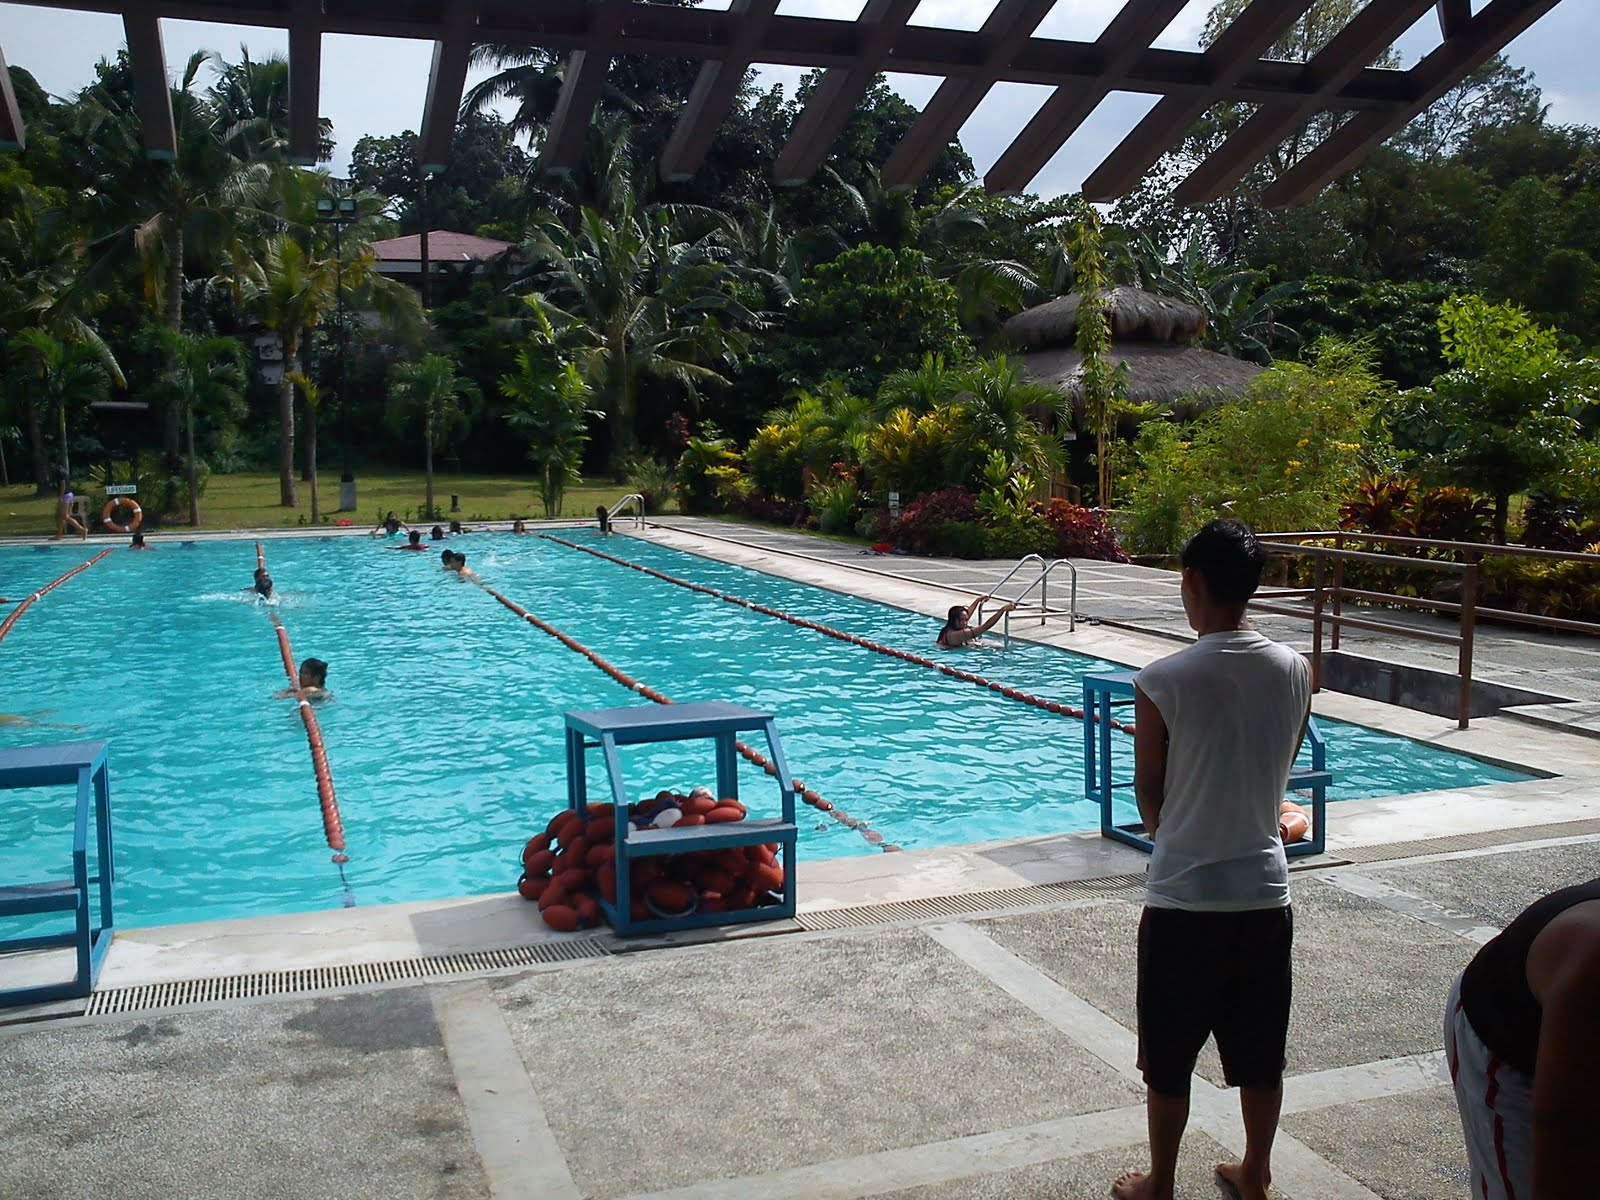 La mesa ecopark new swimming pool complex for Garden city swimming pool